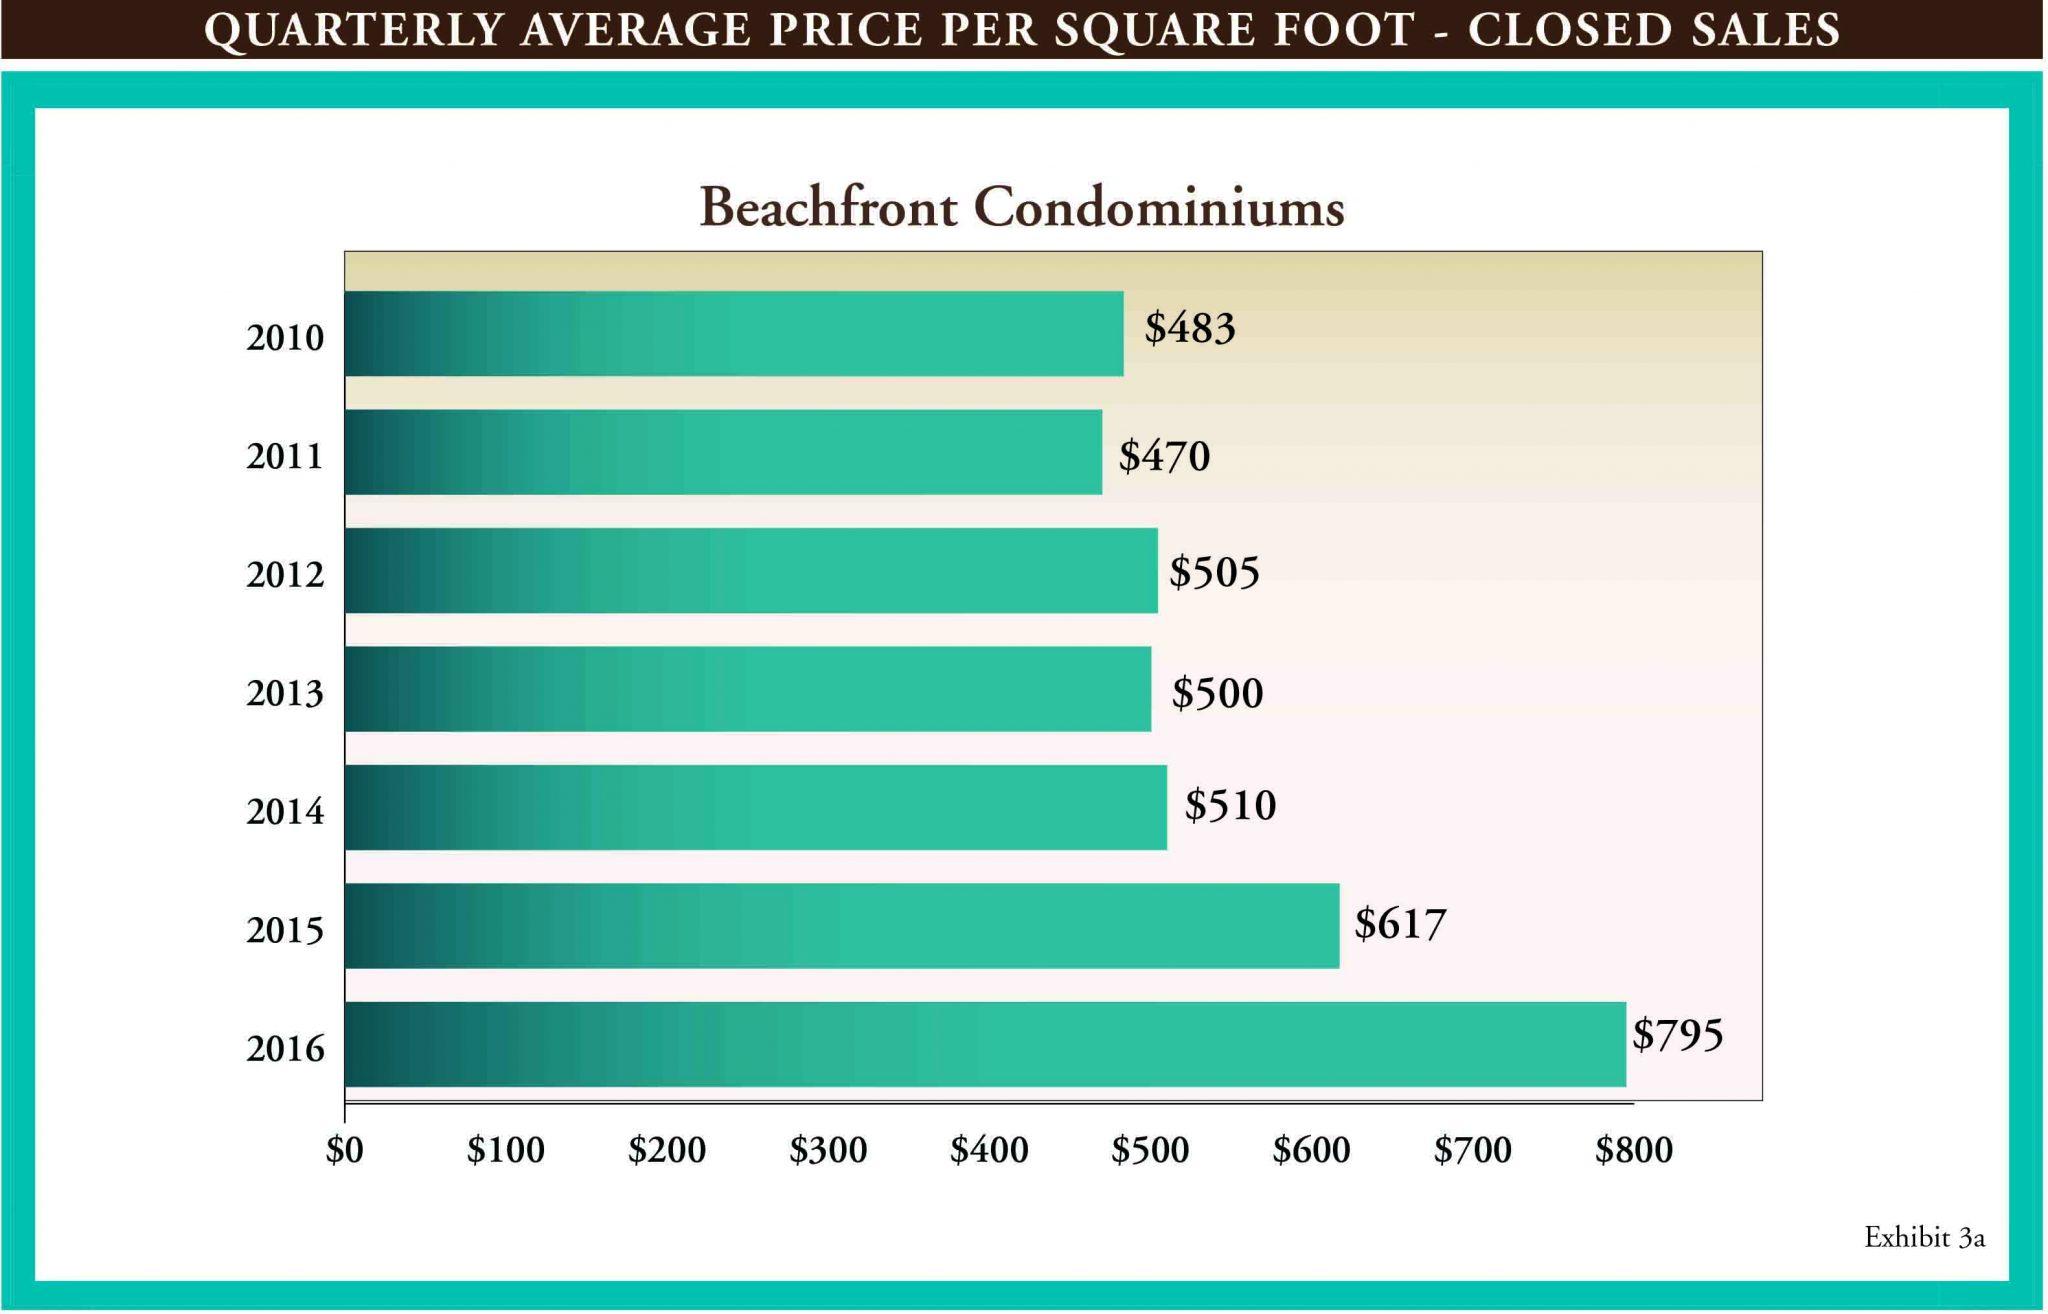 Gulf Shore Blvd Q1 Market Report 2016.indd